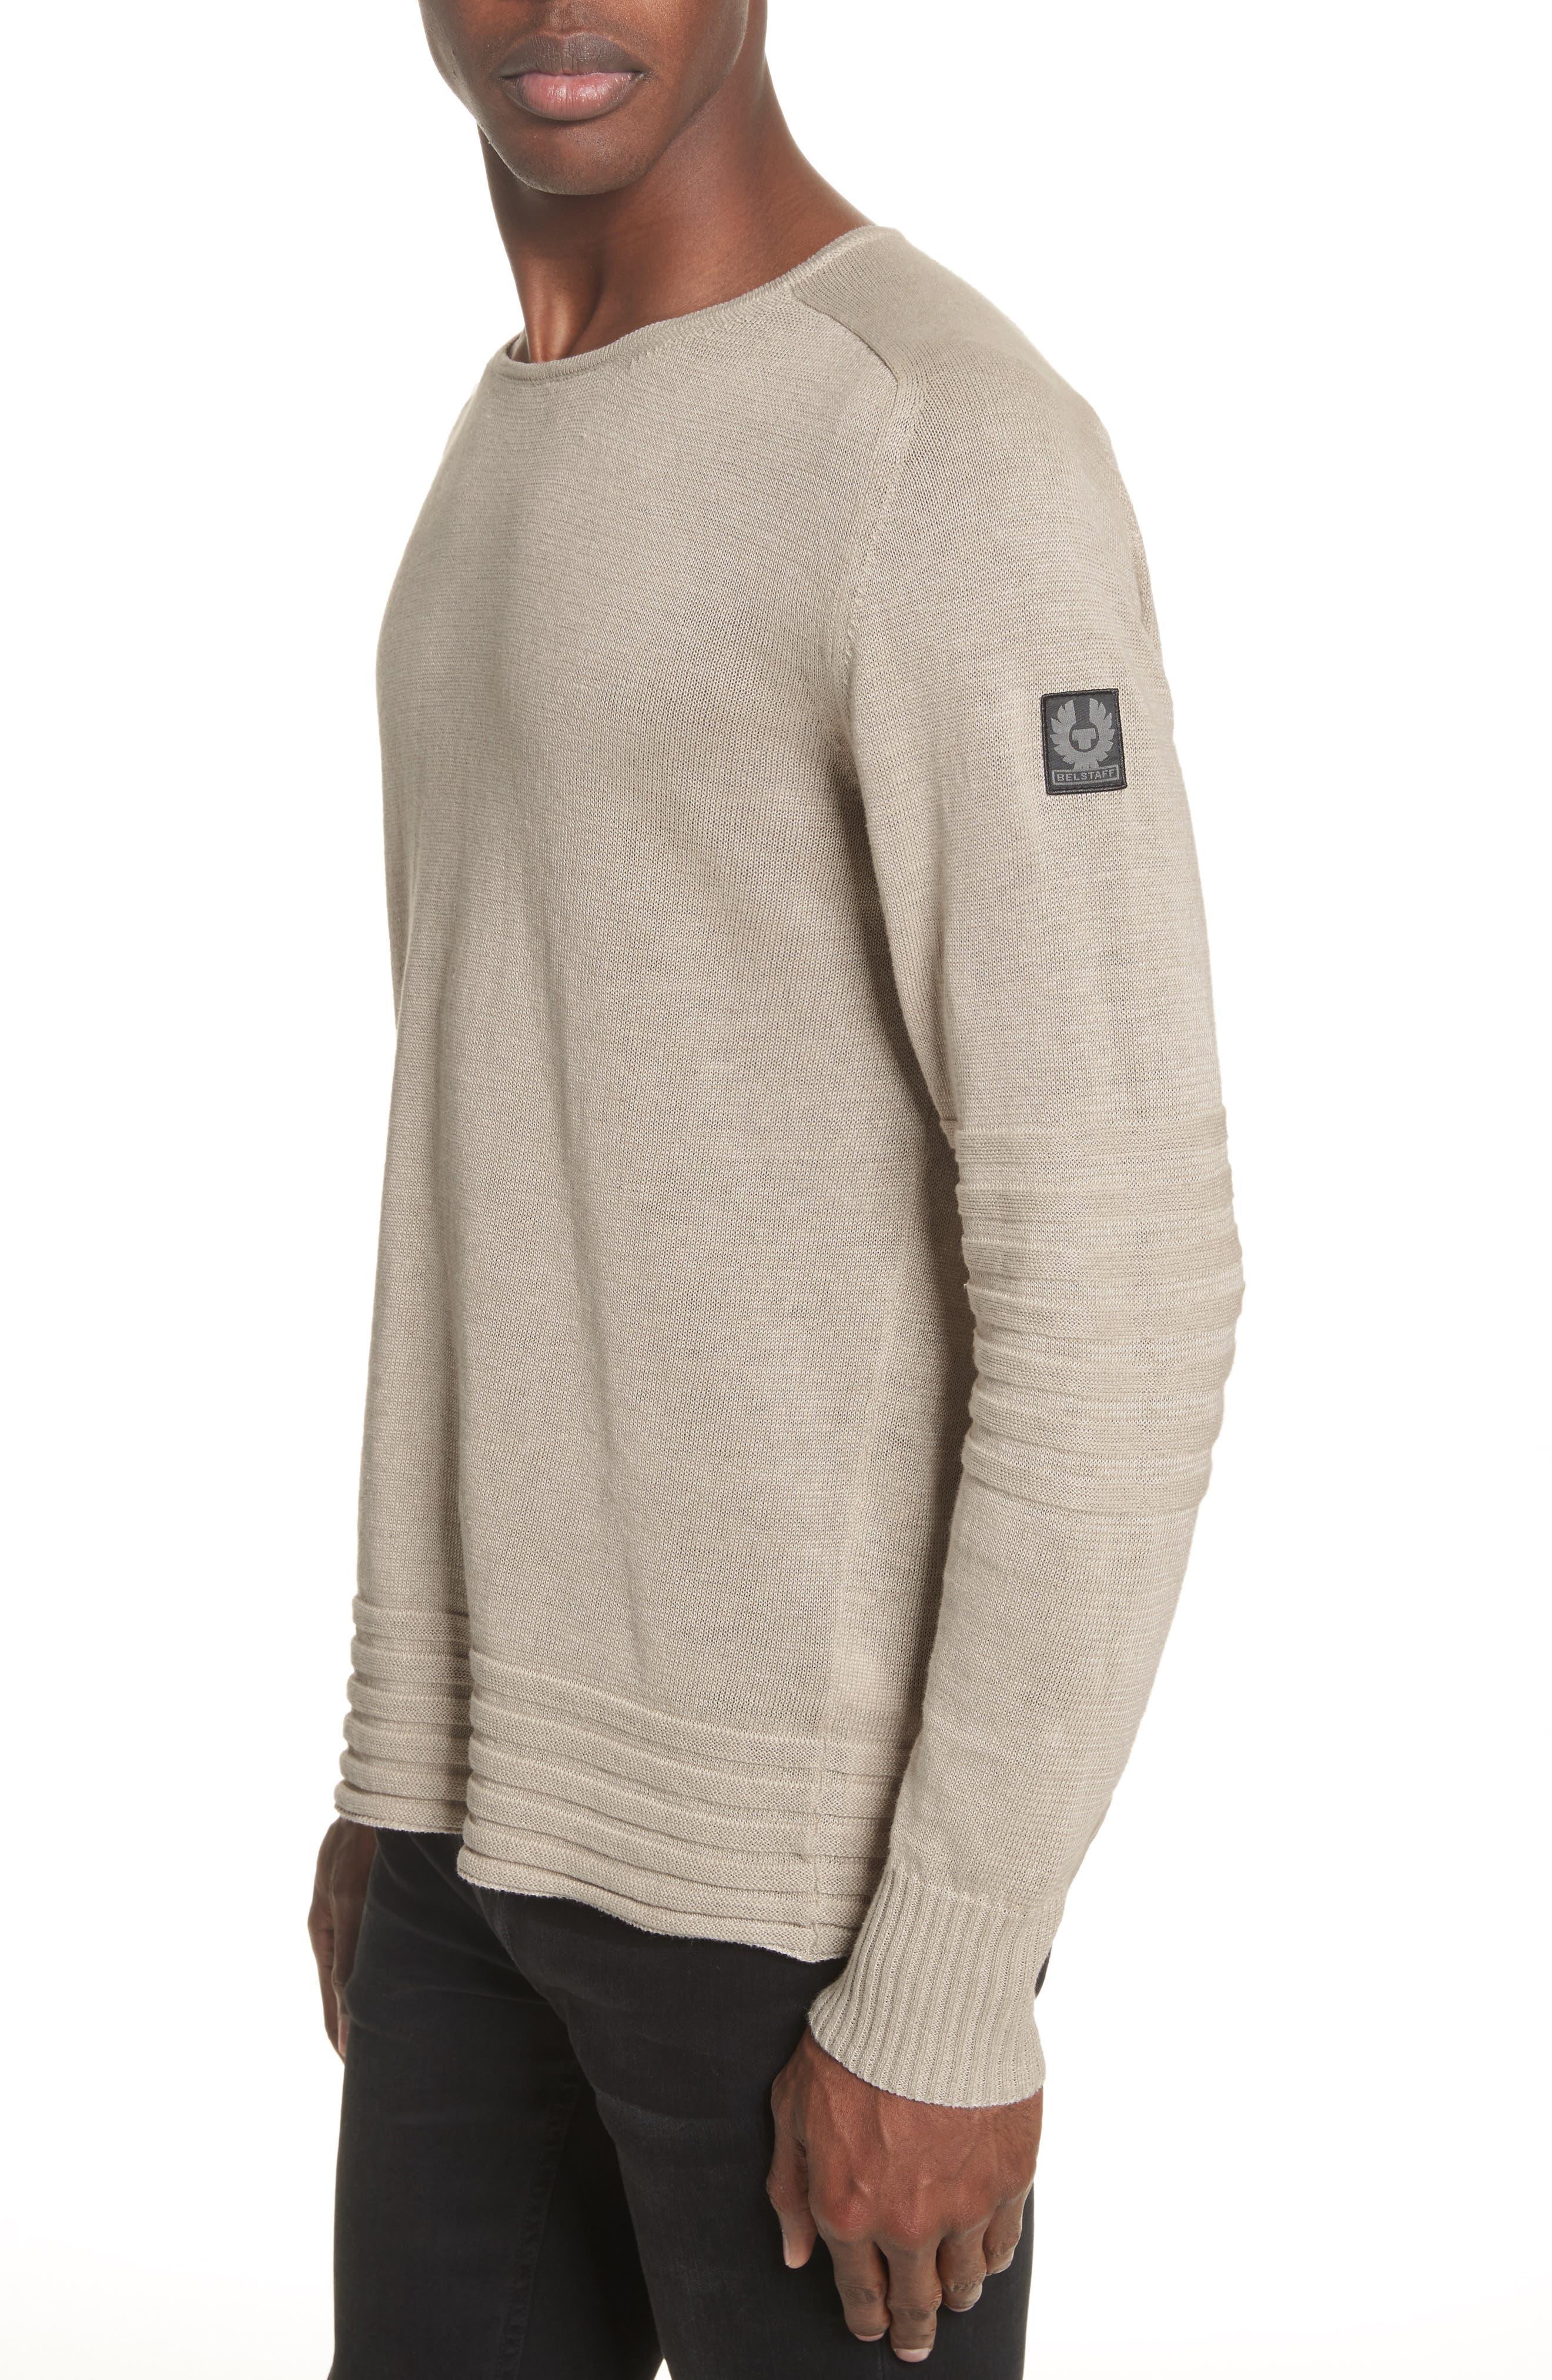 Exford Linen Crewneck Sweater,                             Main thumbnail 1, color,